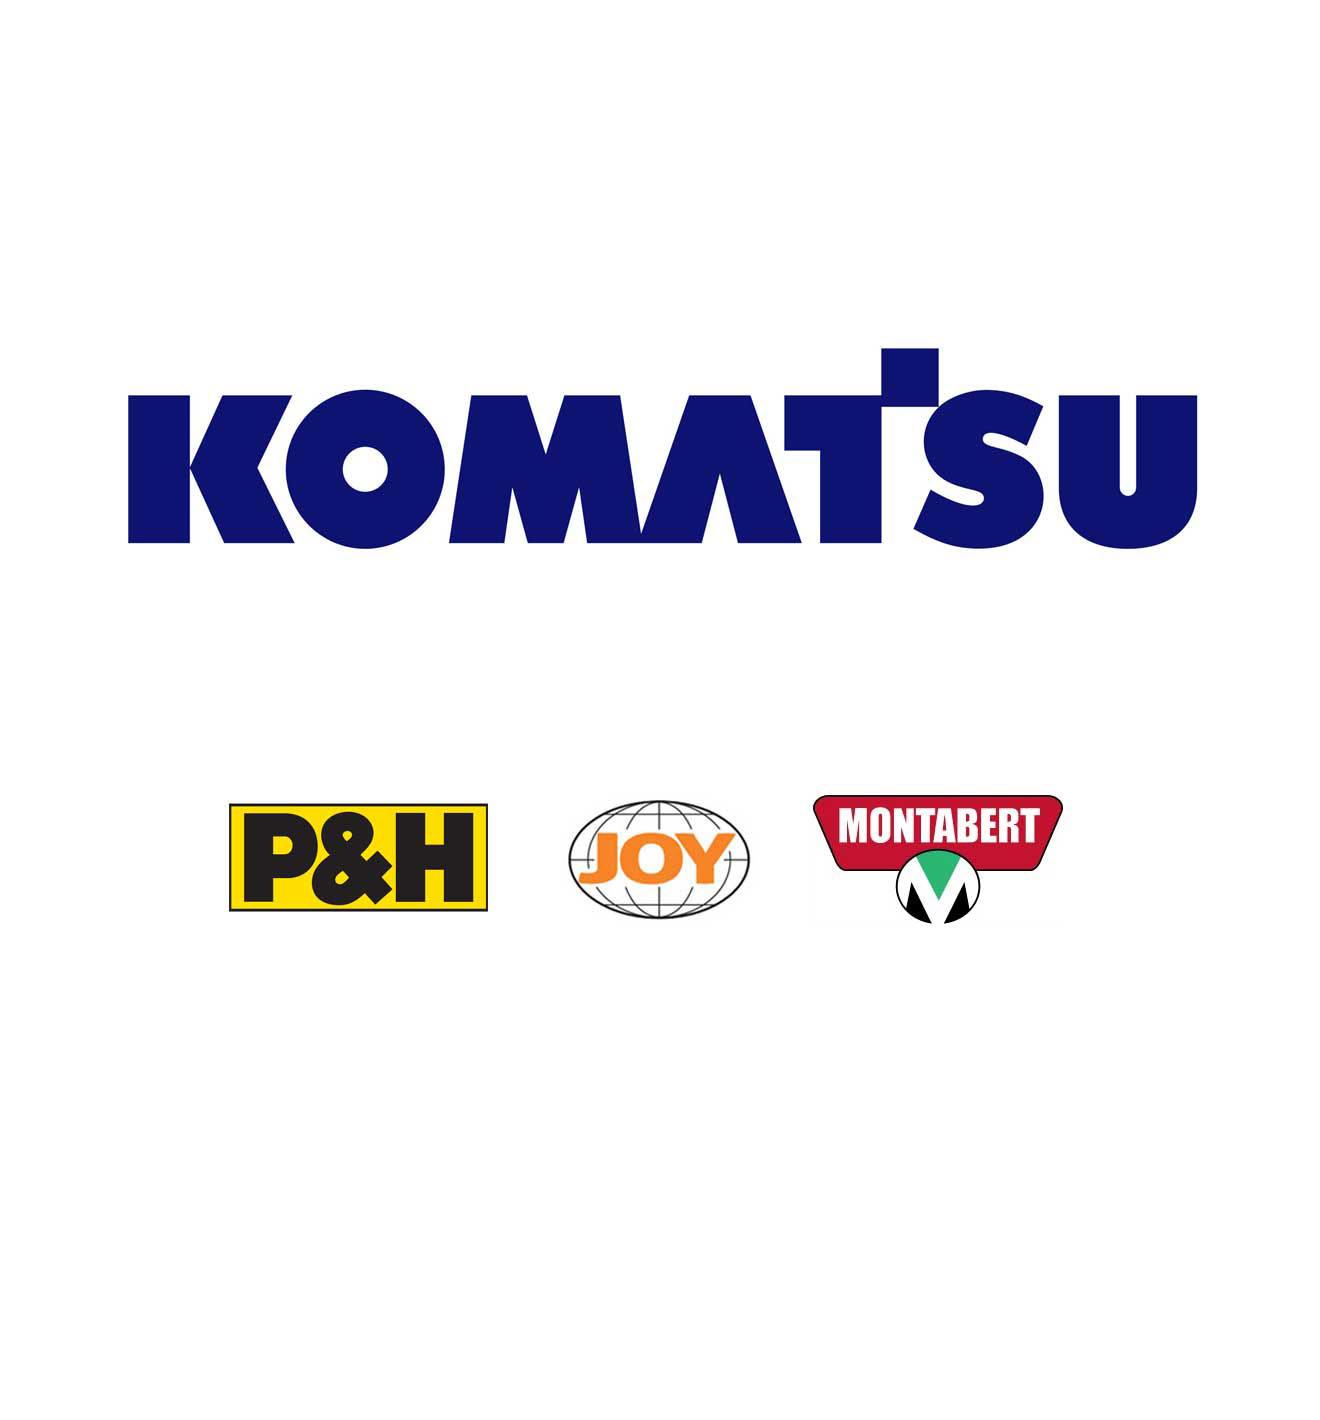 the komatsu ltd company and globalization 株式会社gri globalization research institute  asahi mutual life insurance company  komatsu ltd 外部审计委员.